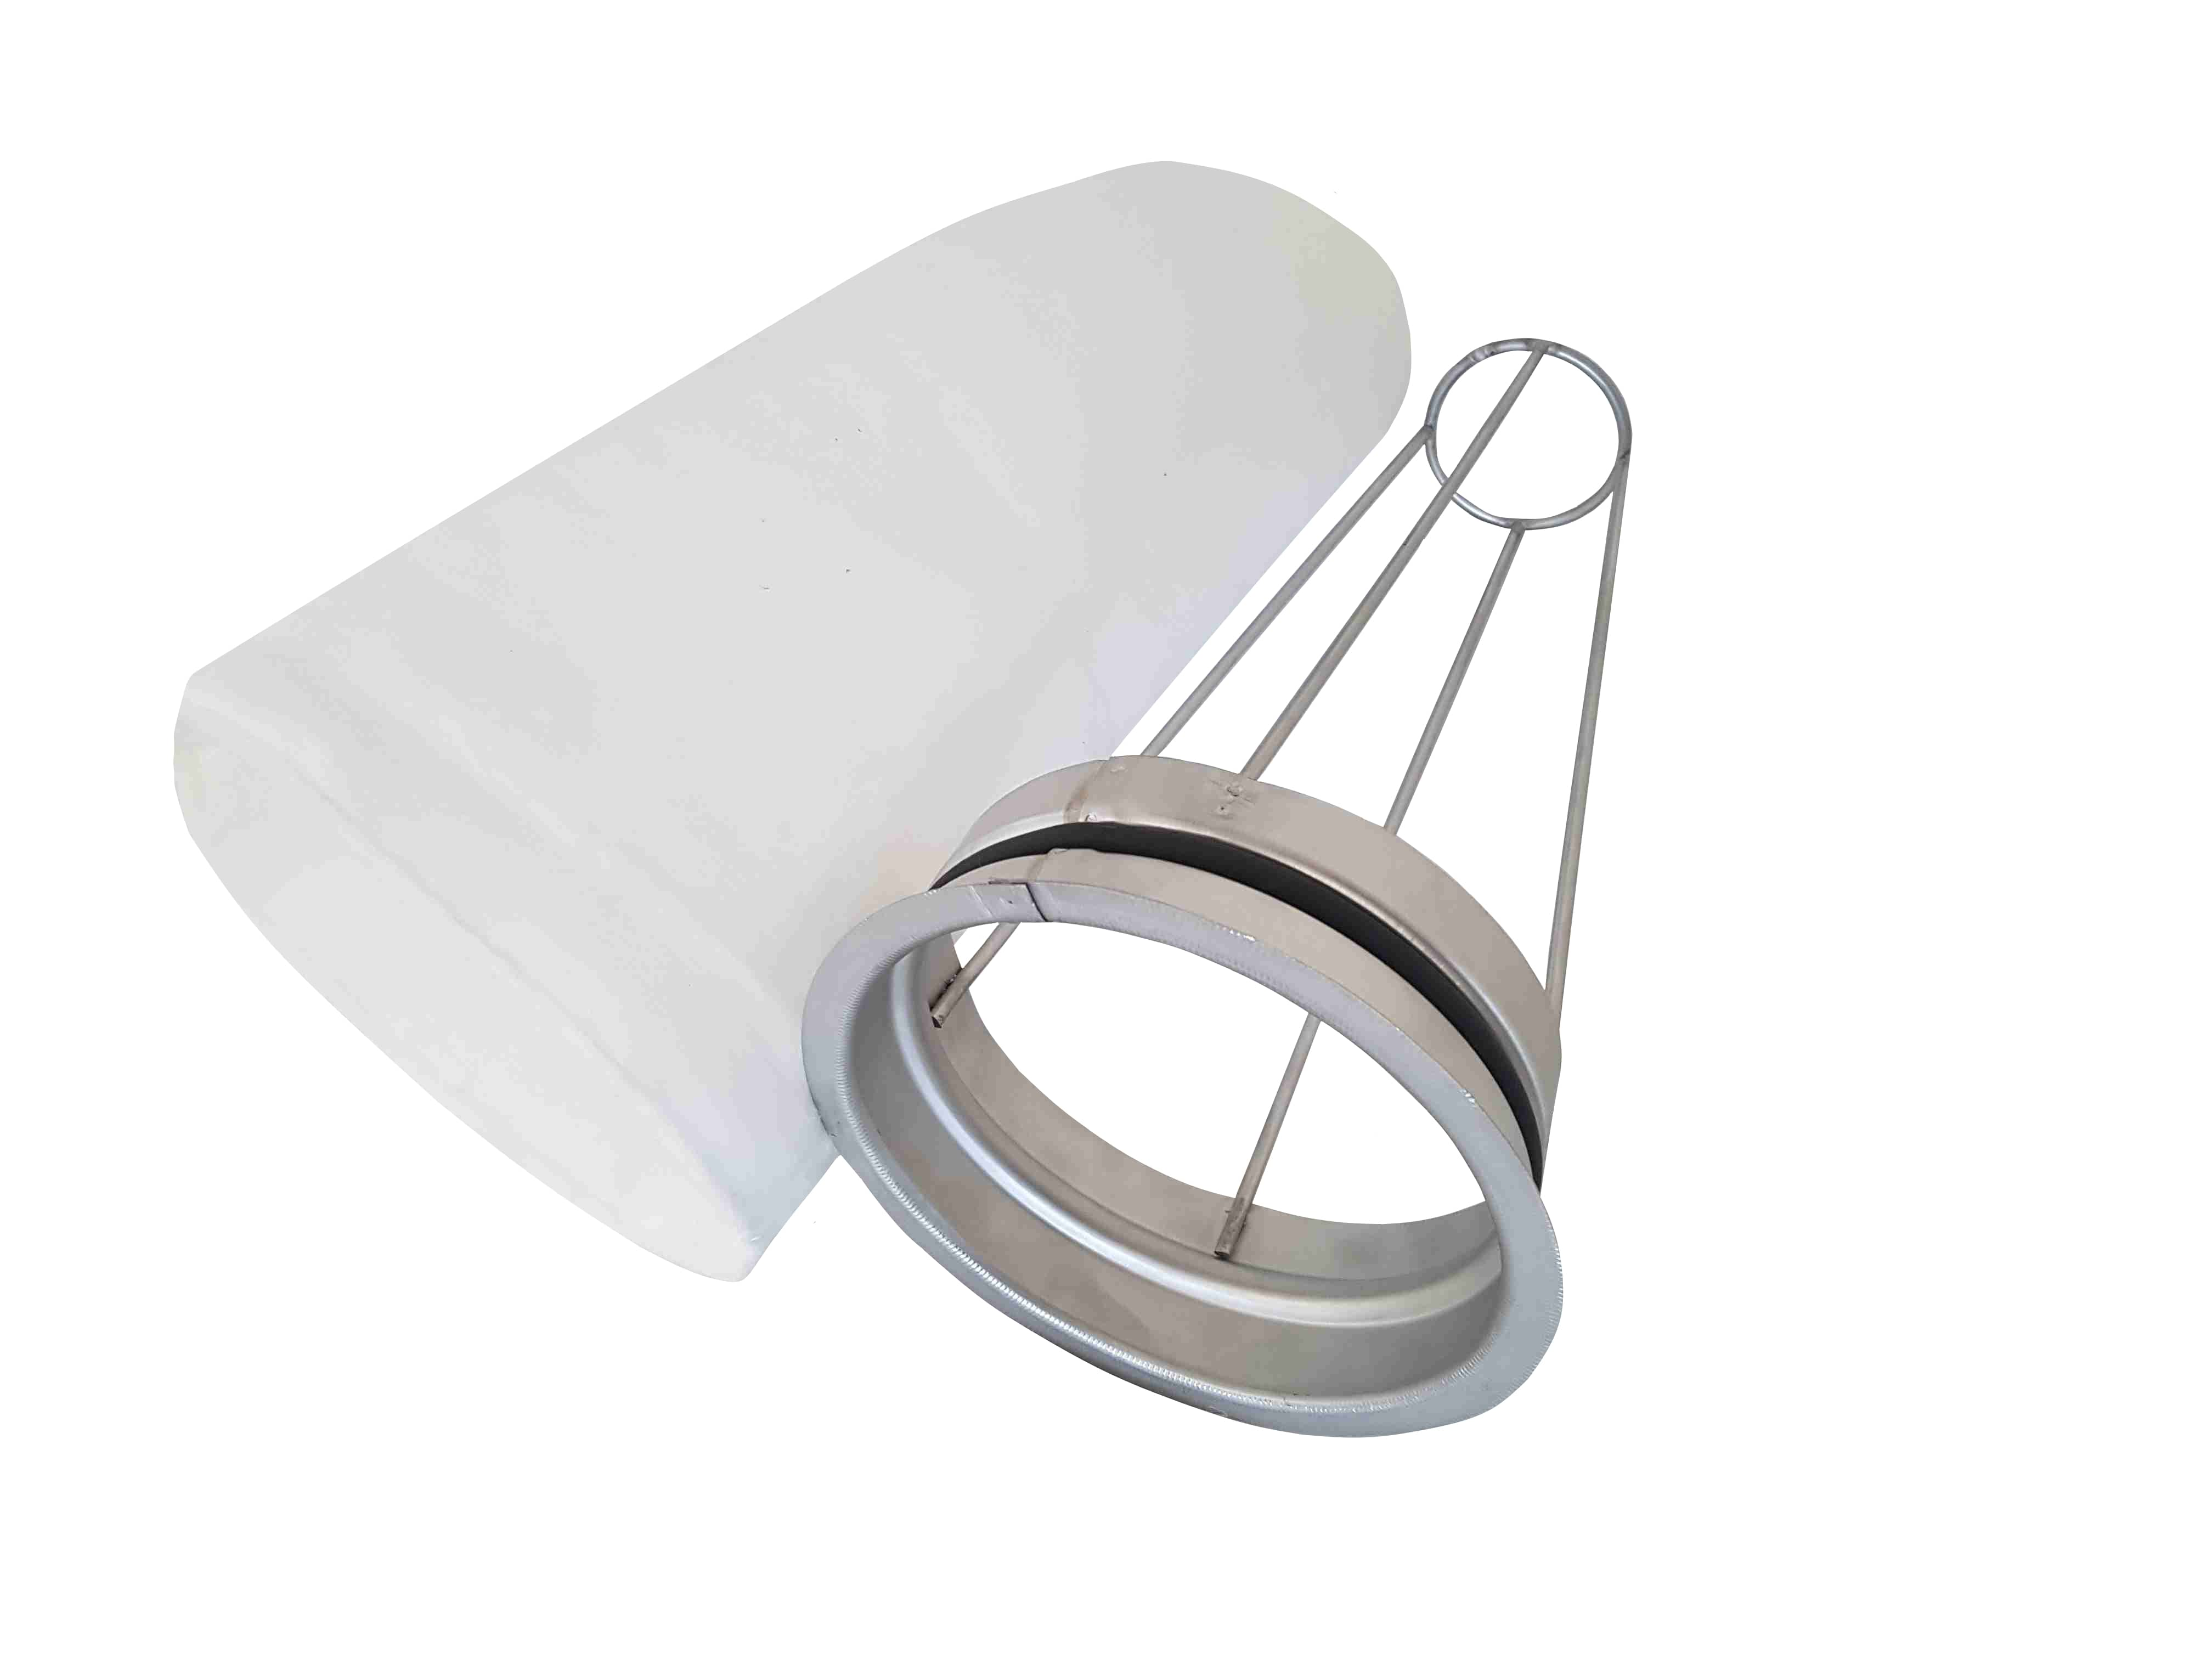 Filterkorb mit Kegelfilter für 2-teiligen Ansaugturm Edelstahl